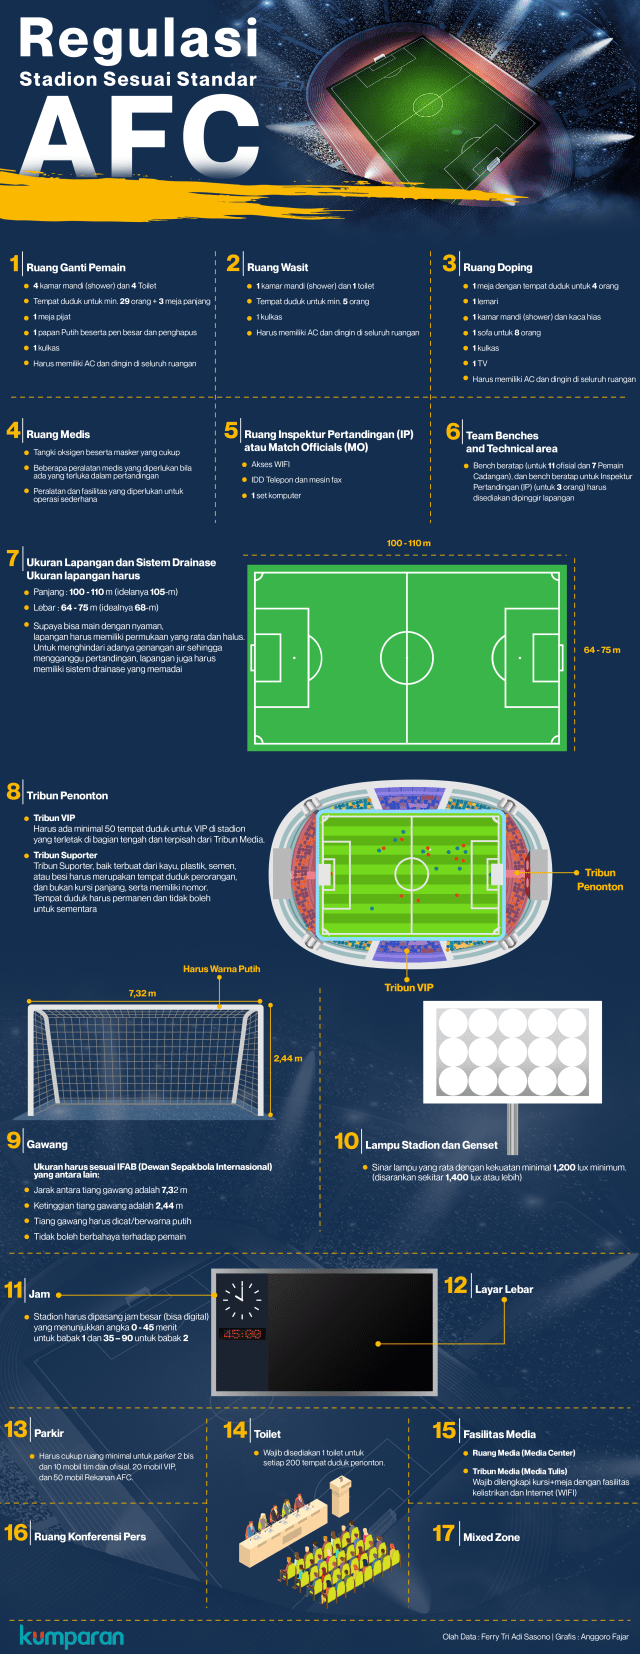 Regulasi Stadion AFC